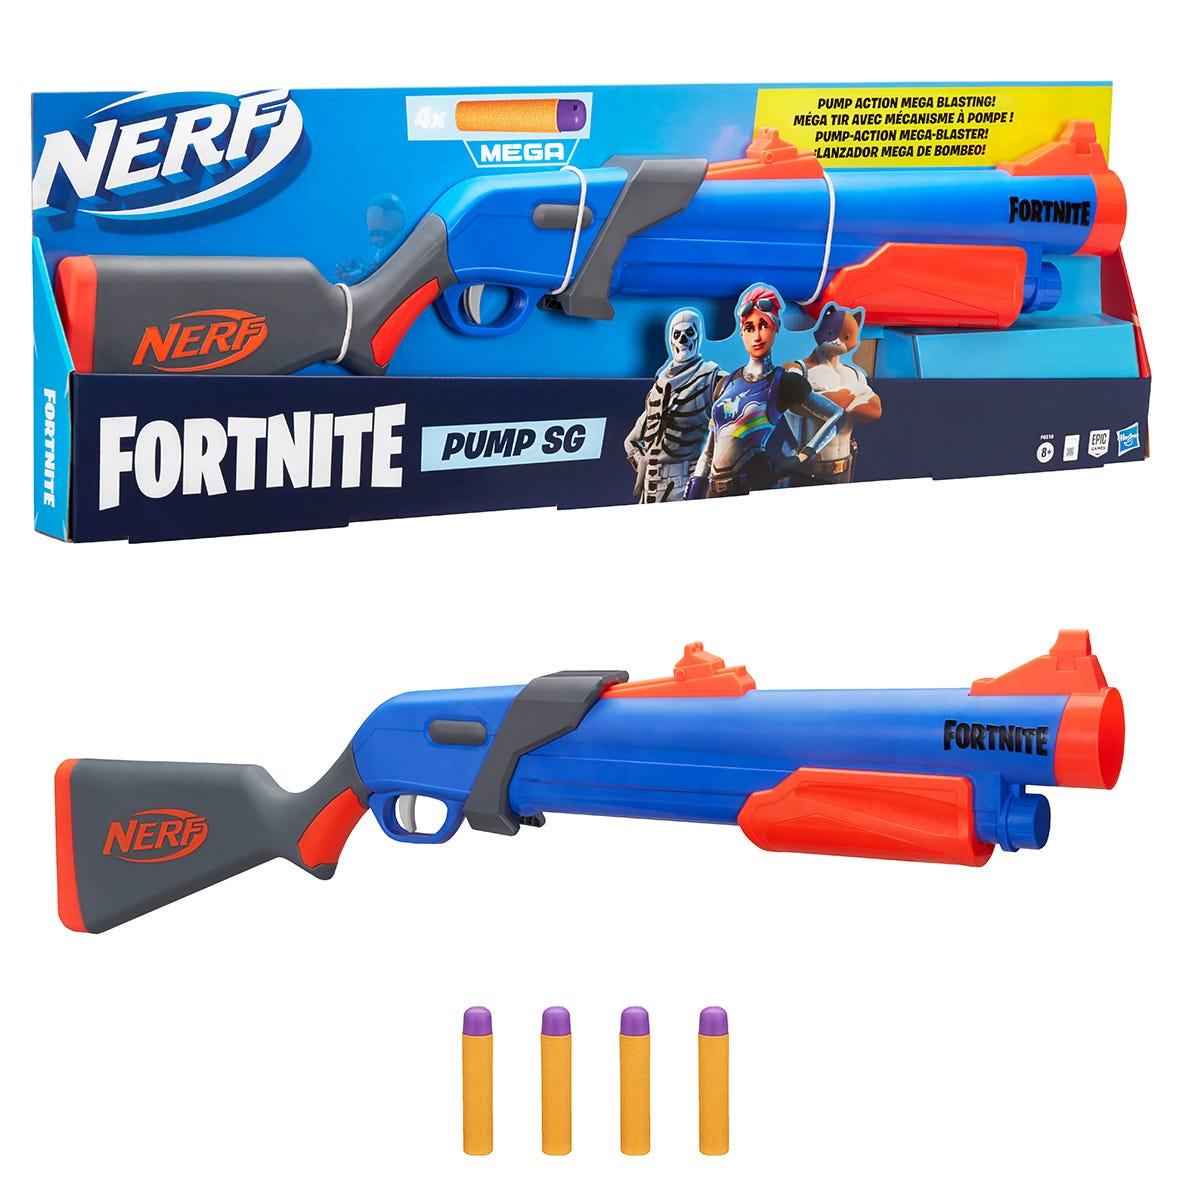 Nerf Fortnite Pump SG Blaster with Pump Action Mega Dart Blasting, Breech Load, 4 Nerf Mega Darts